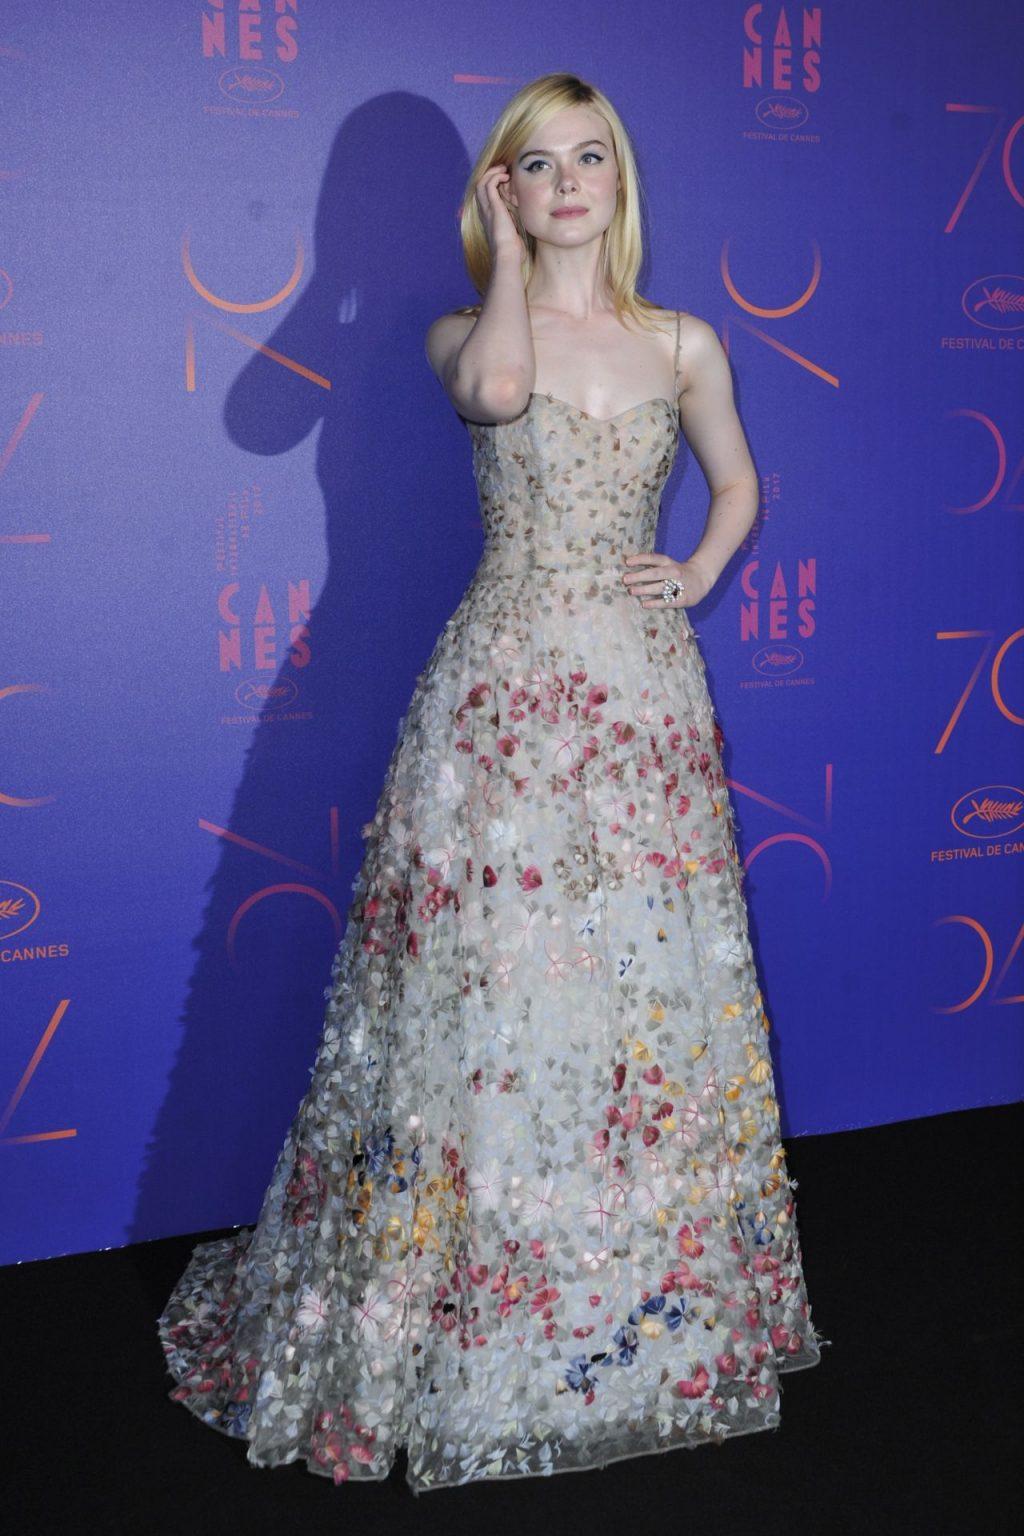 Elle Fanning diện đầm hoa Dior trong bữa tiệc Cannes 2017